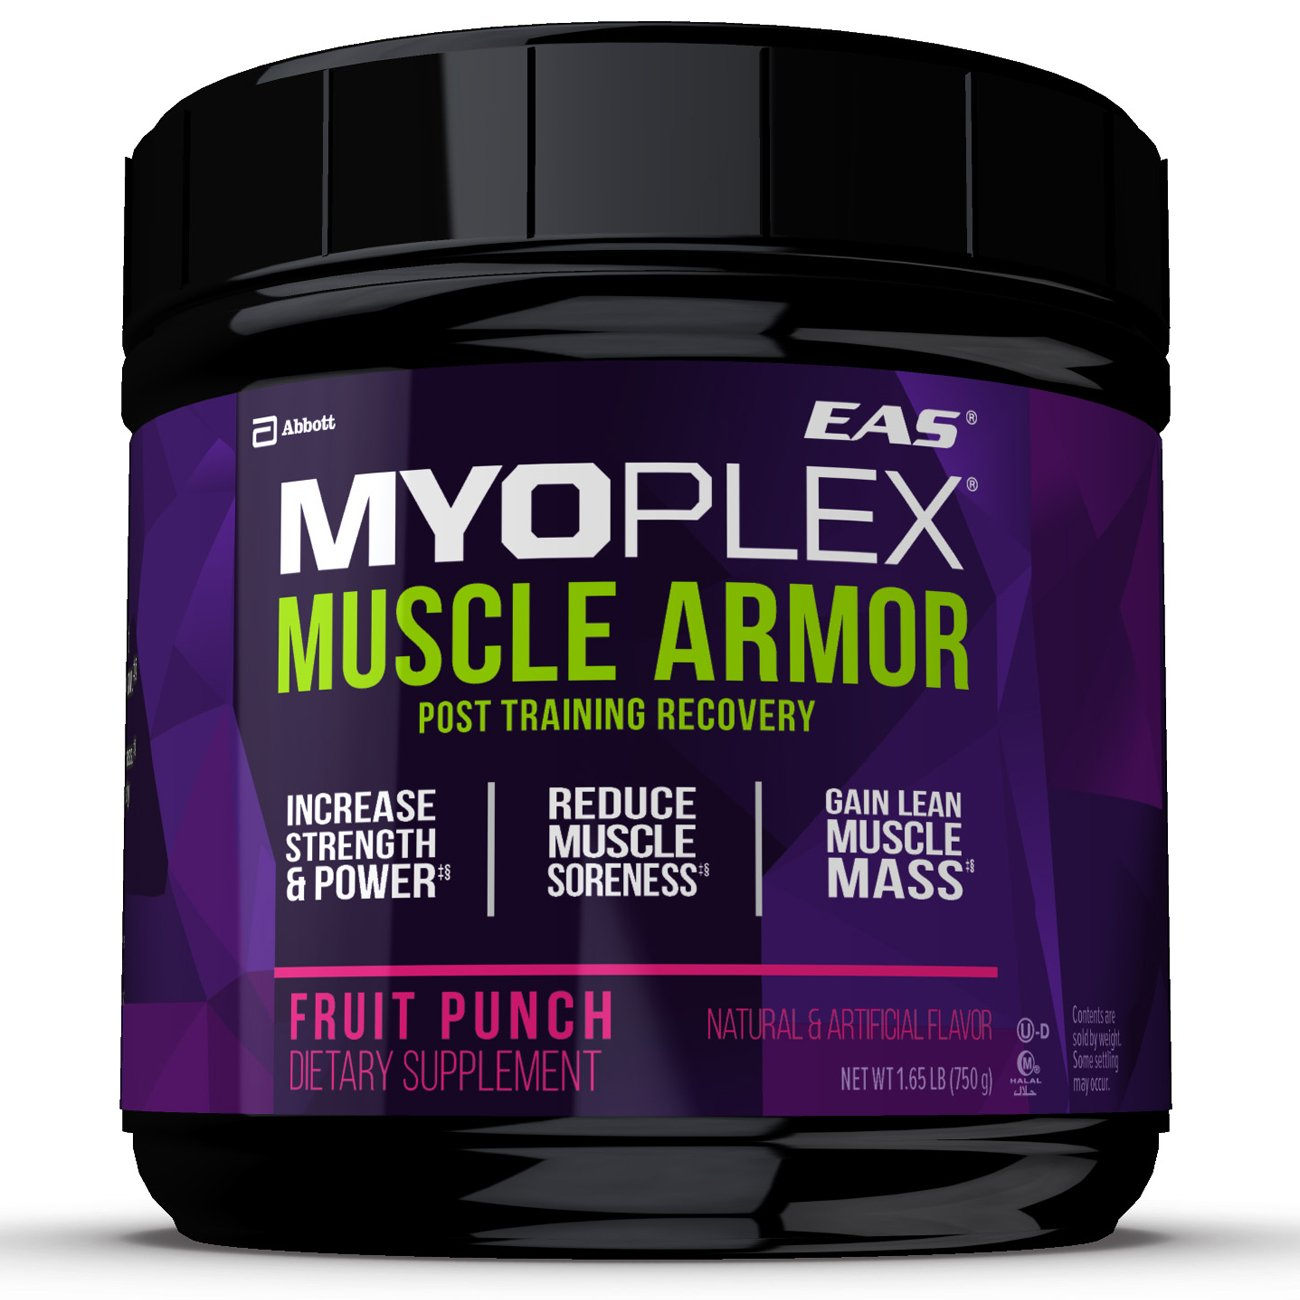 EAS Myoplex Muscle Armor Powder, Fruit Punch, 1.65 Pound